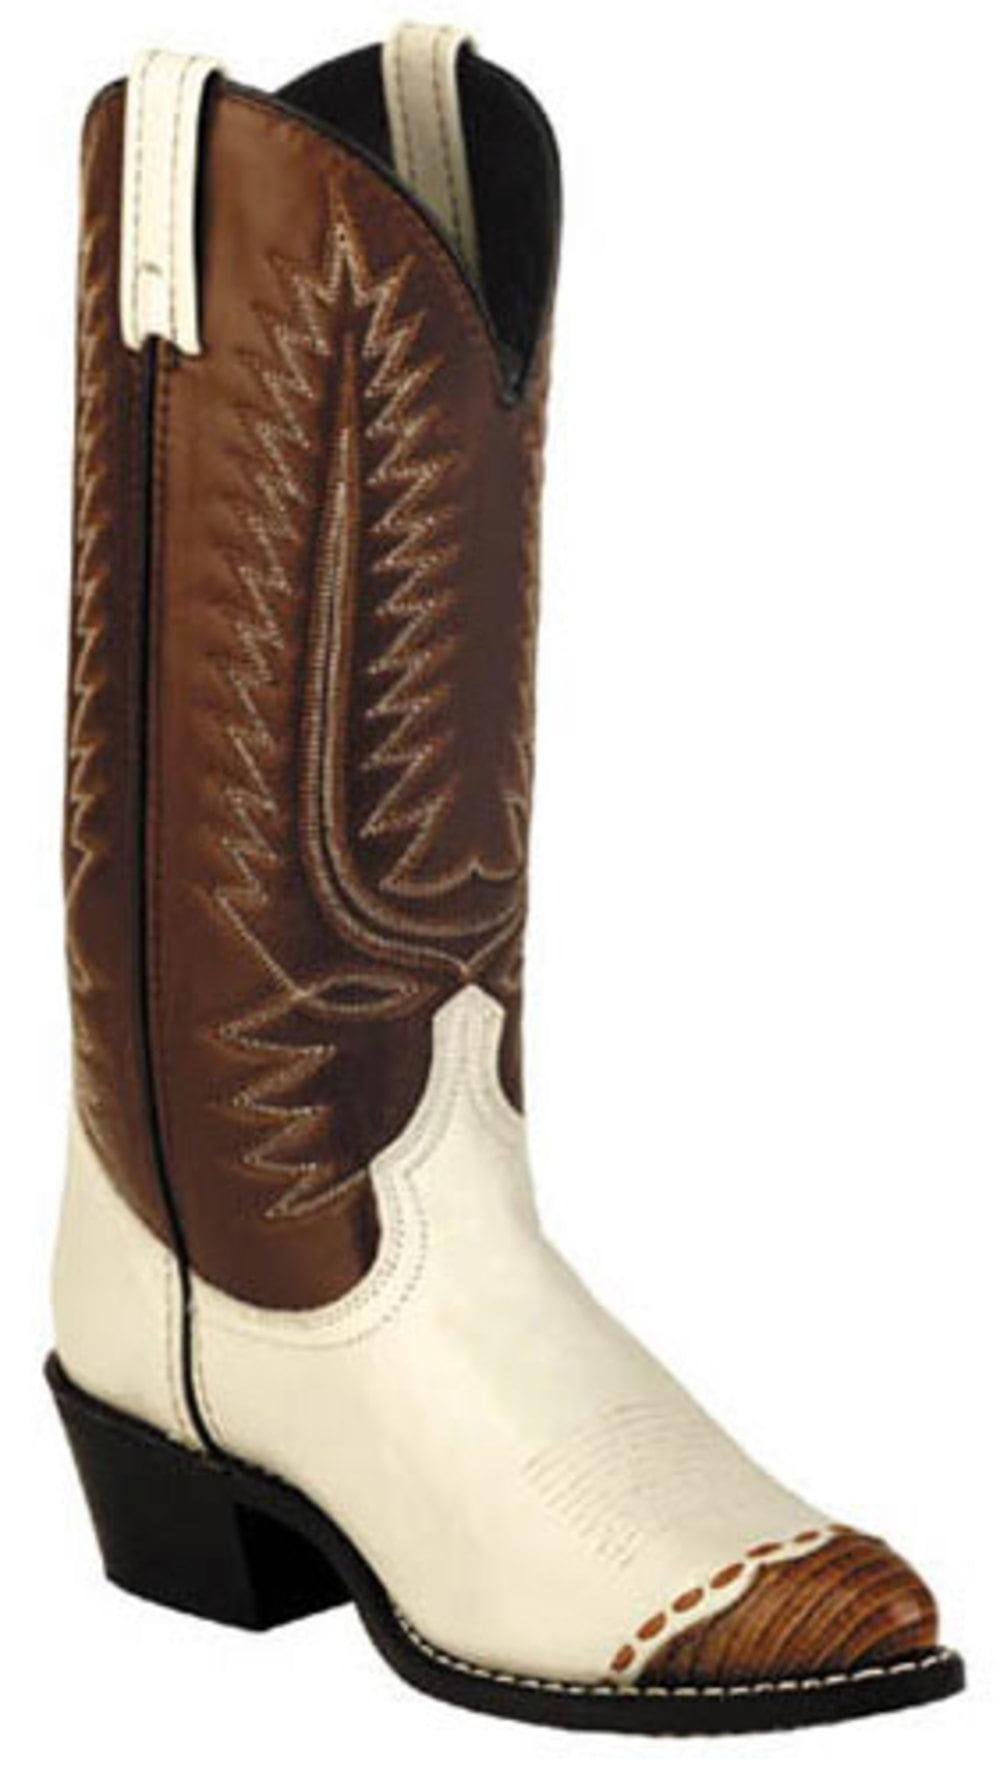 "Men's Laredo 13"" Classic Cowboy Boots TAN 6.5 EW by"